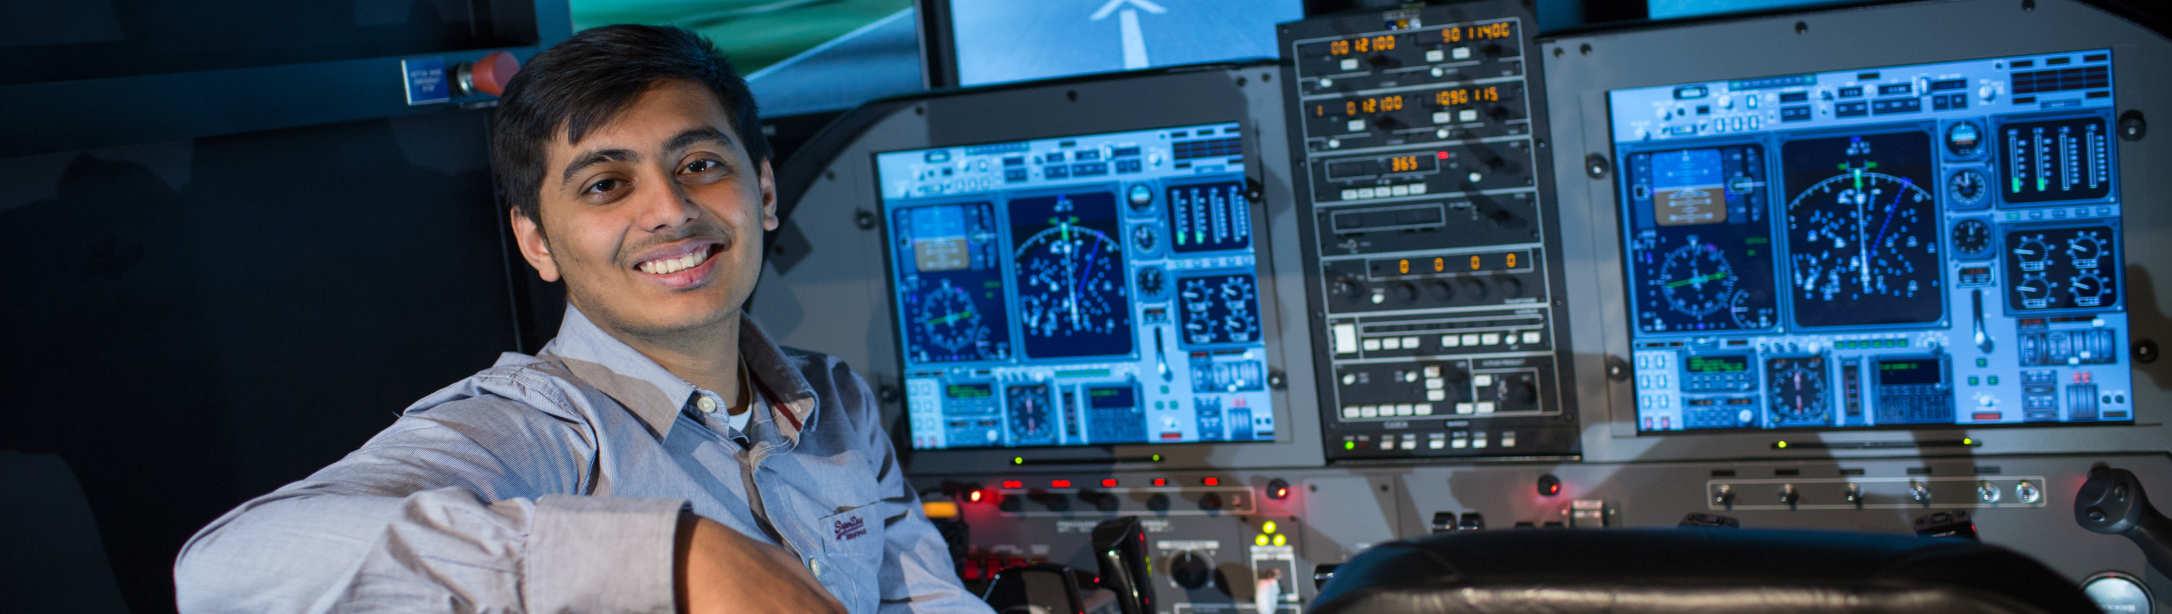 Advanced Aeronautical Engineering